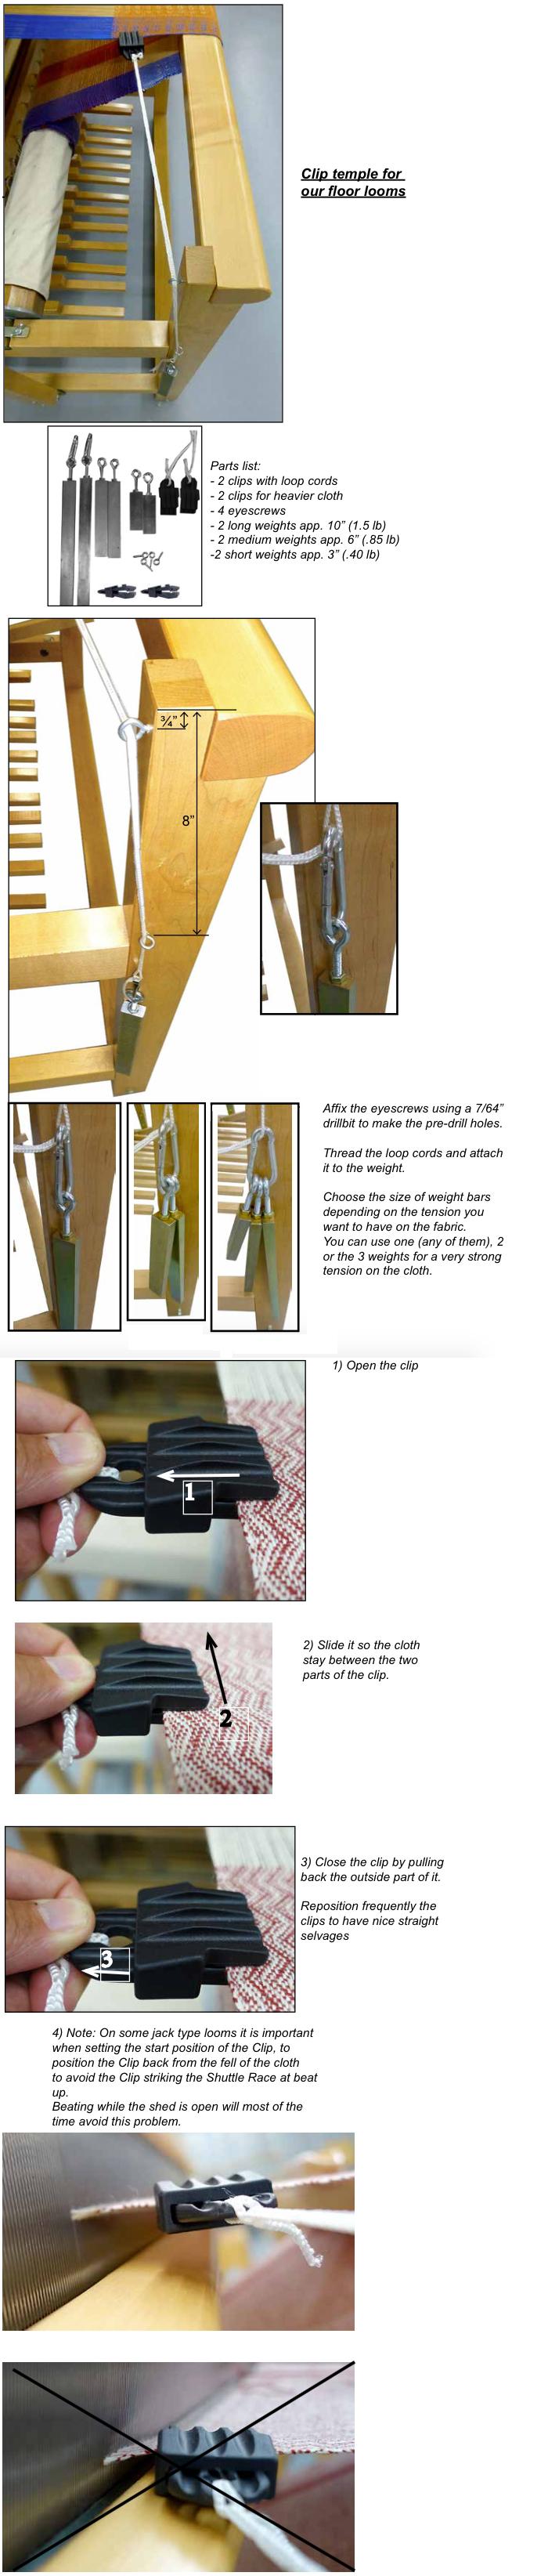 Leclerc Clip Temple Kit - Various Widths   The Woolery